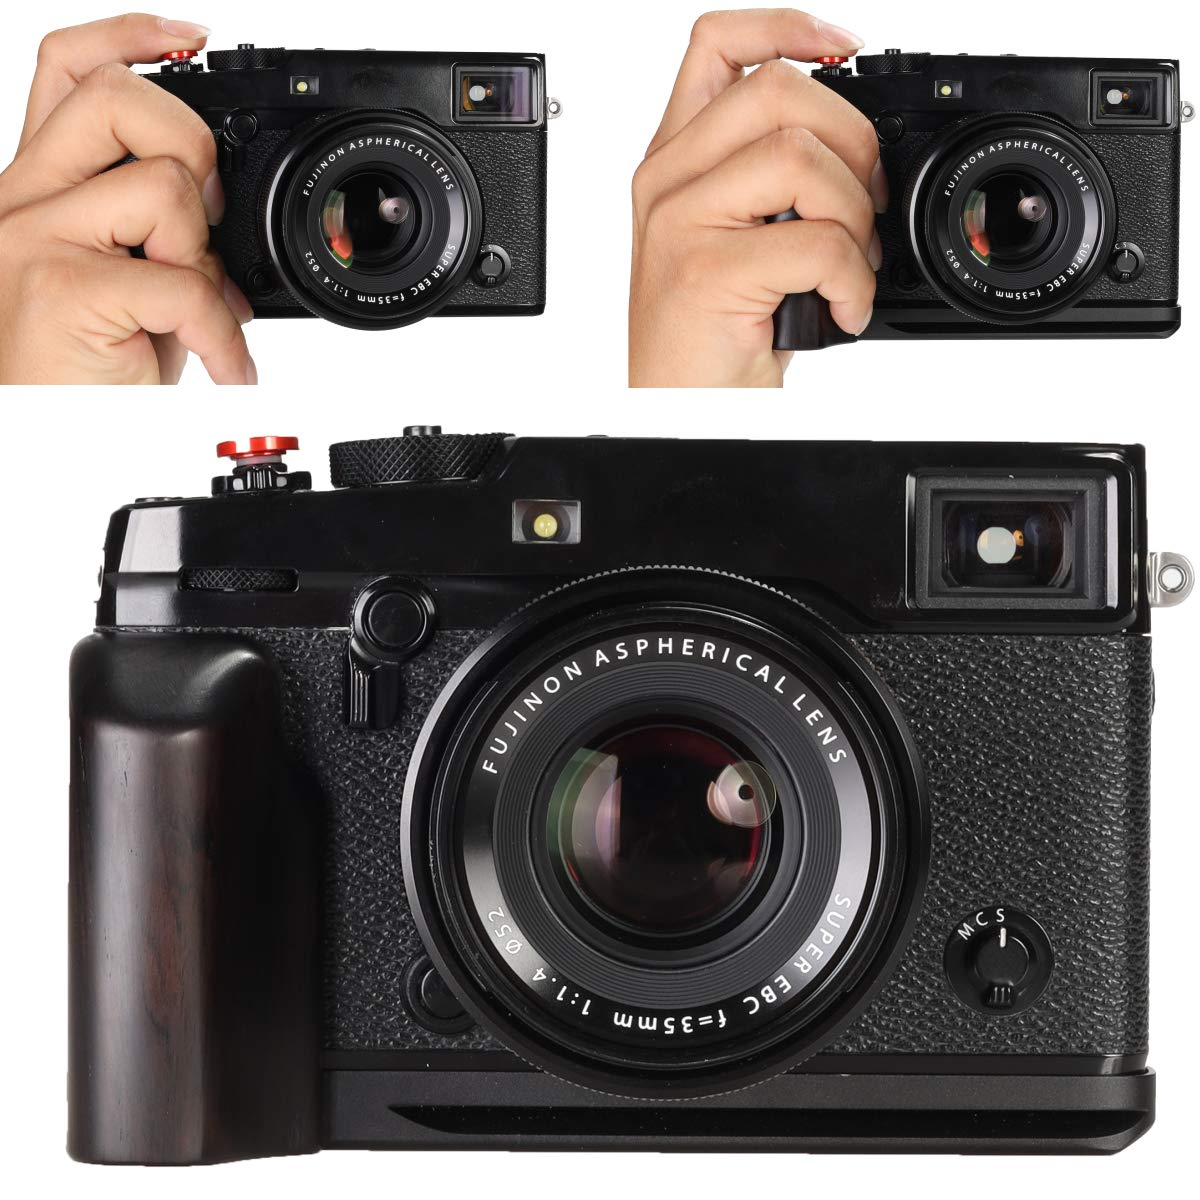 WEPOTO GP-X1EM-B Tripod Quick Release L Plate Metal Bracket Wooden Camera Hand Grip For Sony A9 A7III A7M3 a7RIII a7RM3 a7RII a7RM2 a7II a7M2 a7SII a7SM2